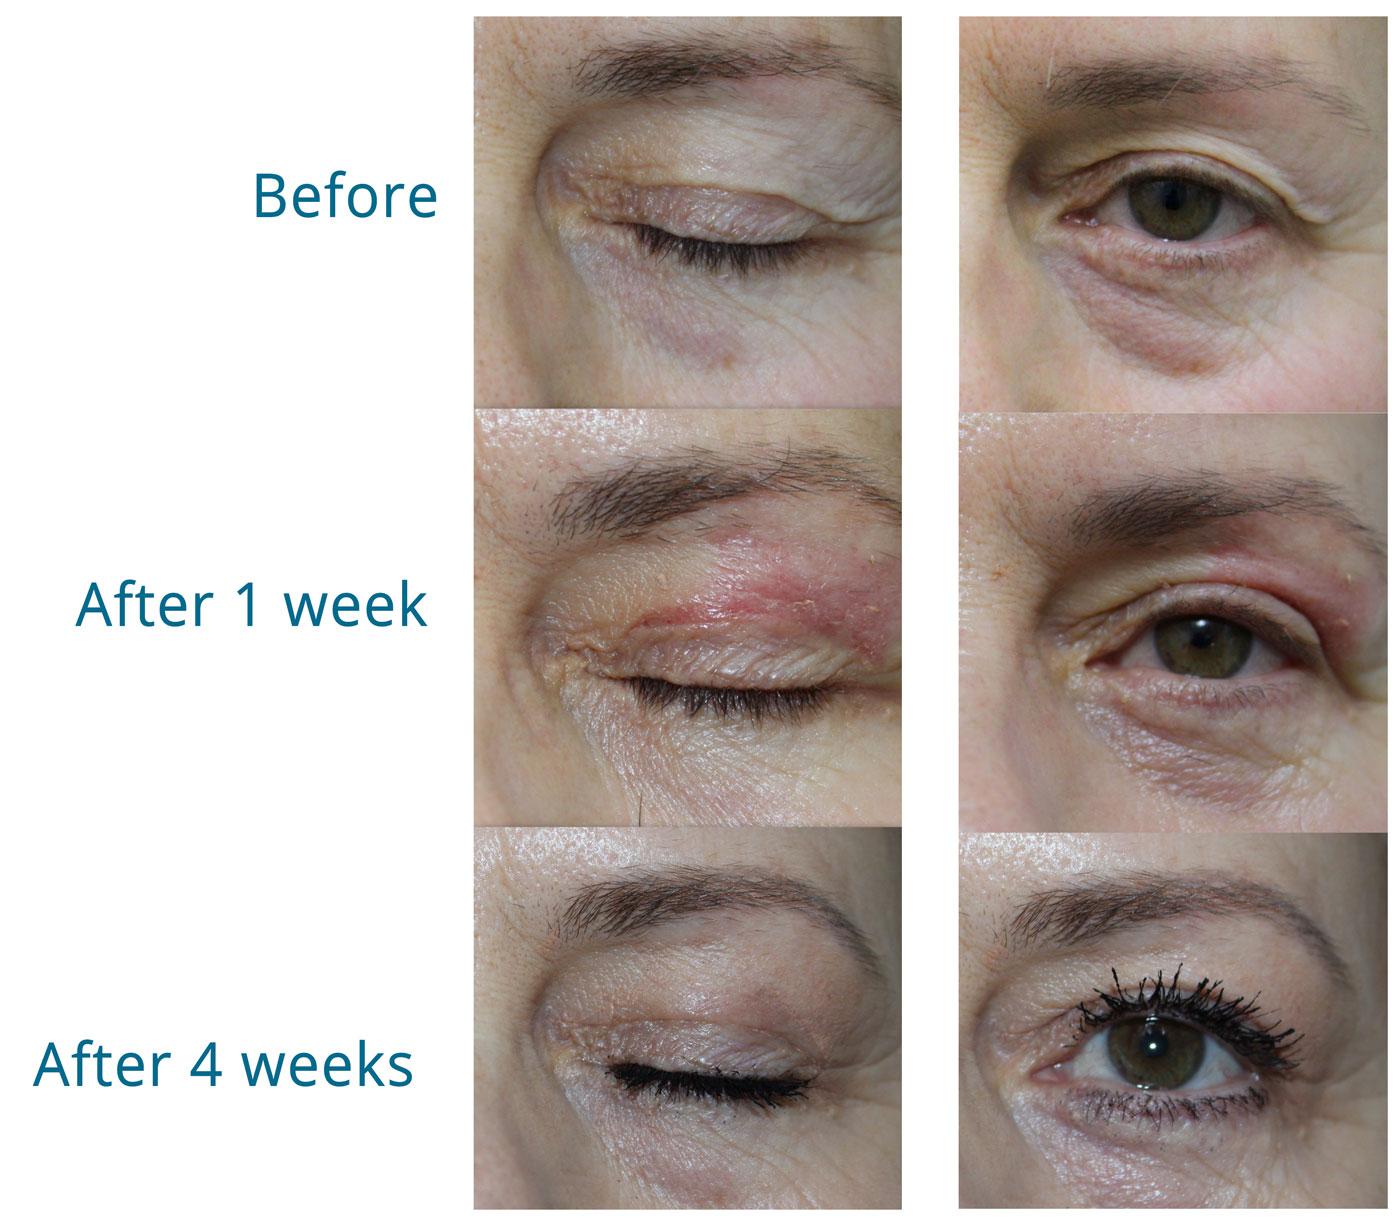 zwelling na ooglidcorrectie